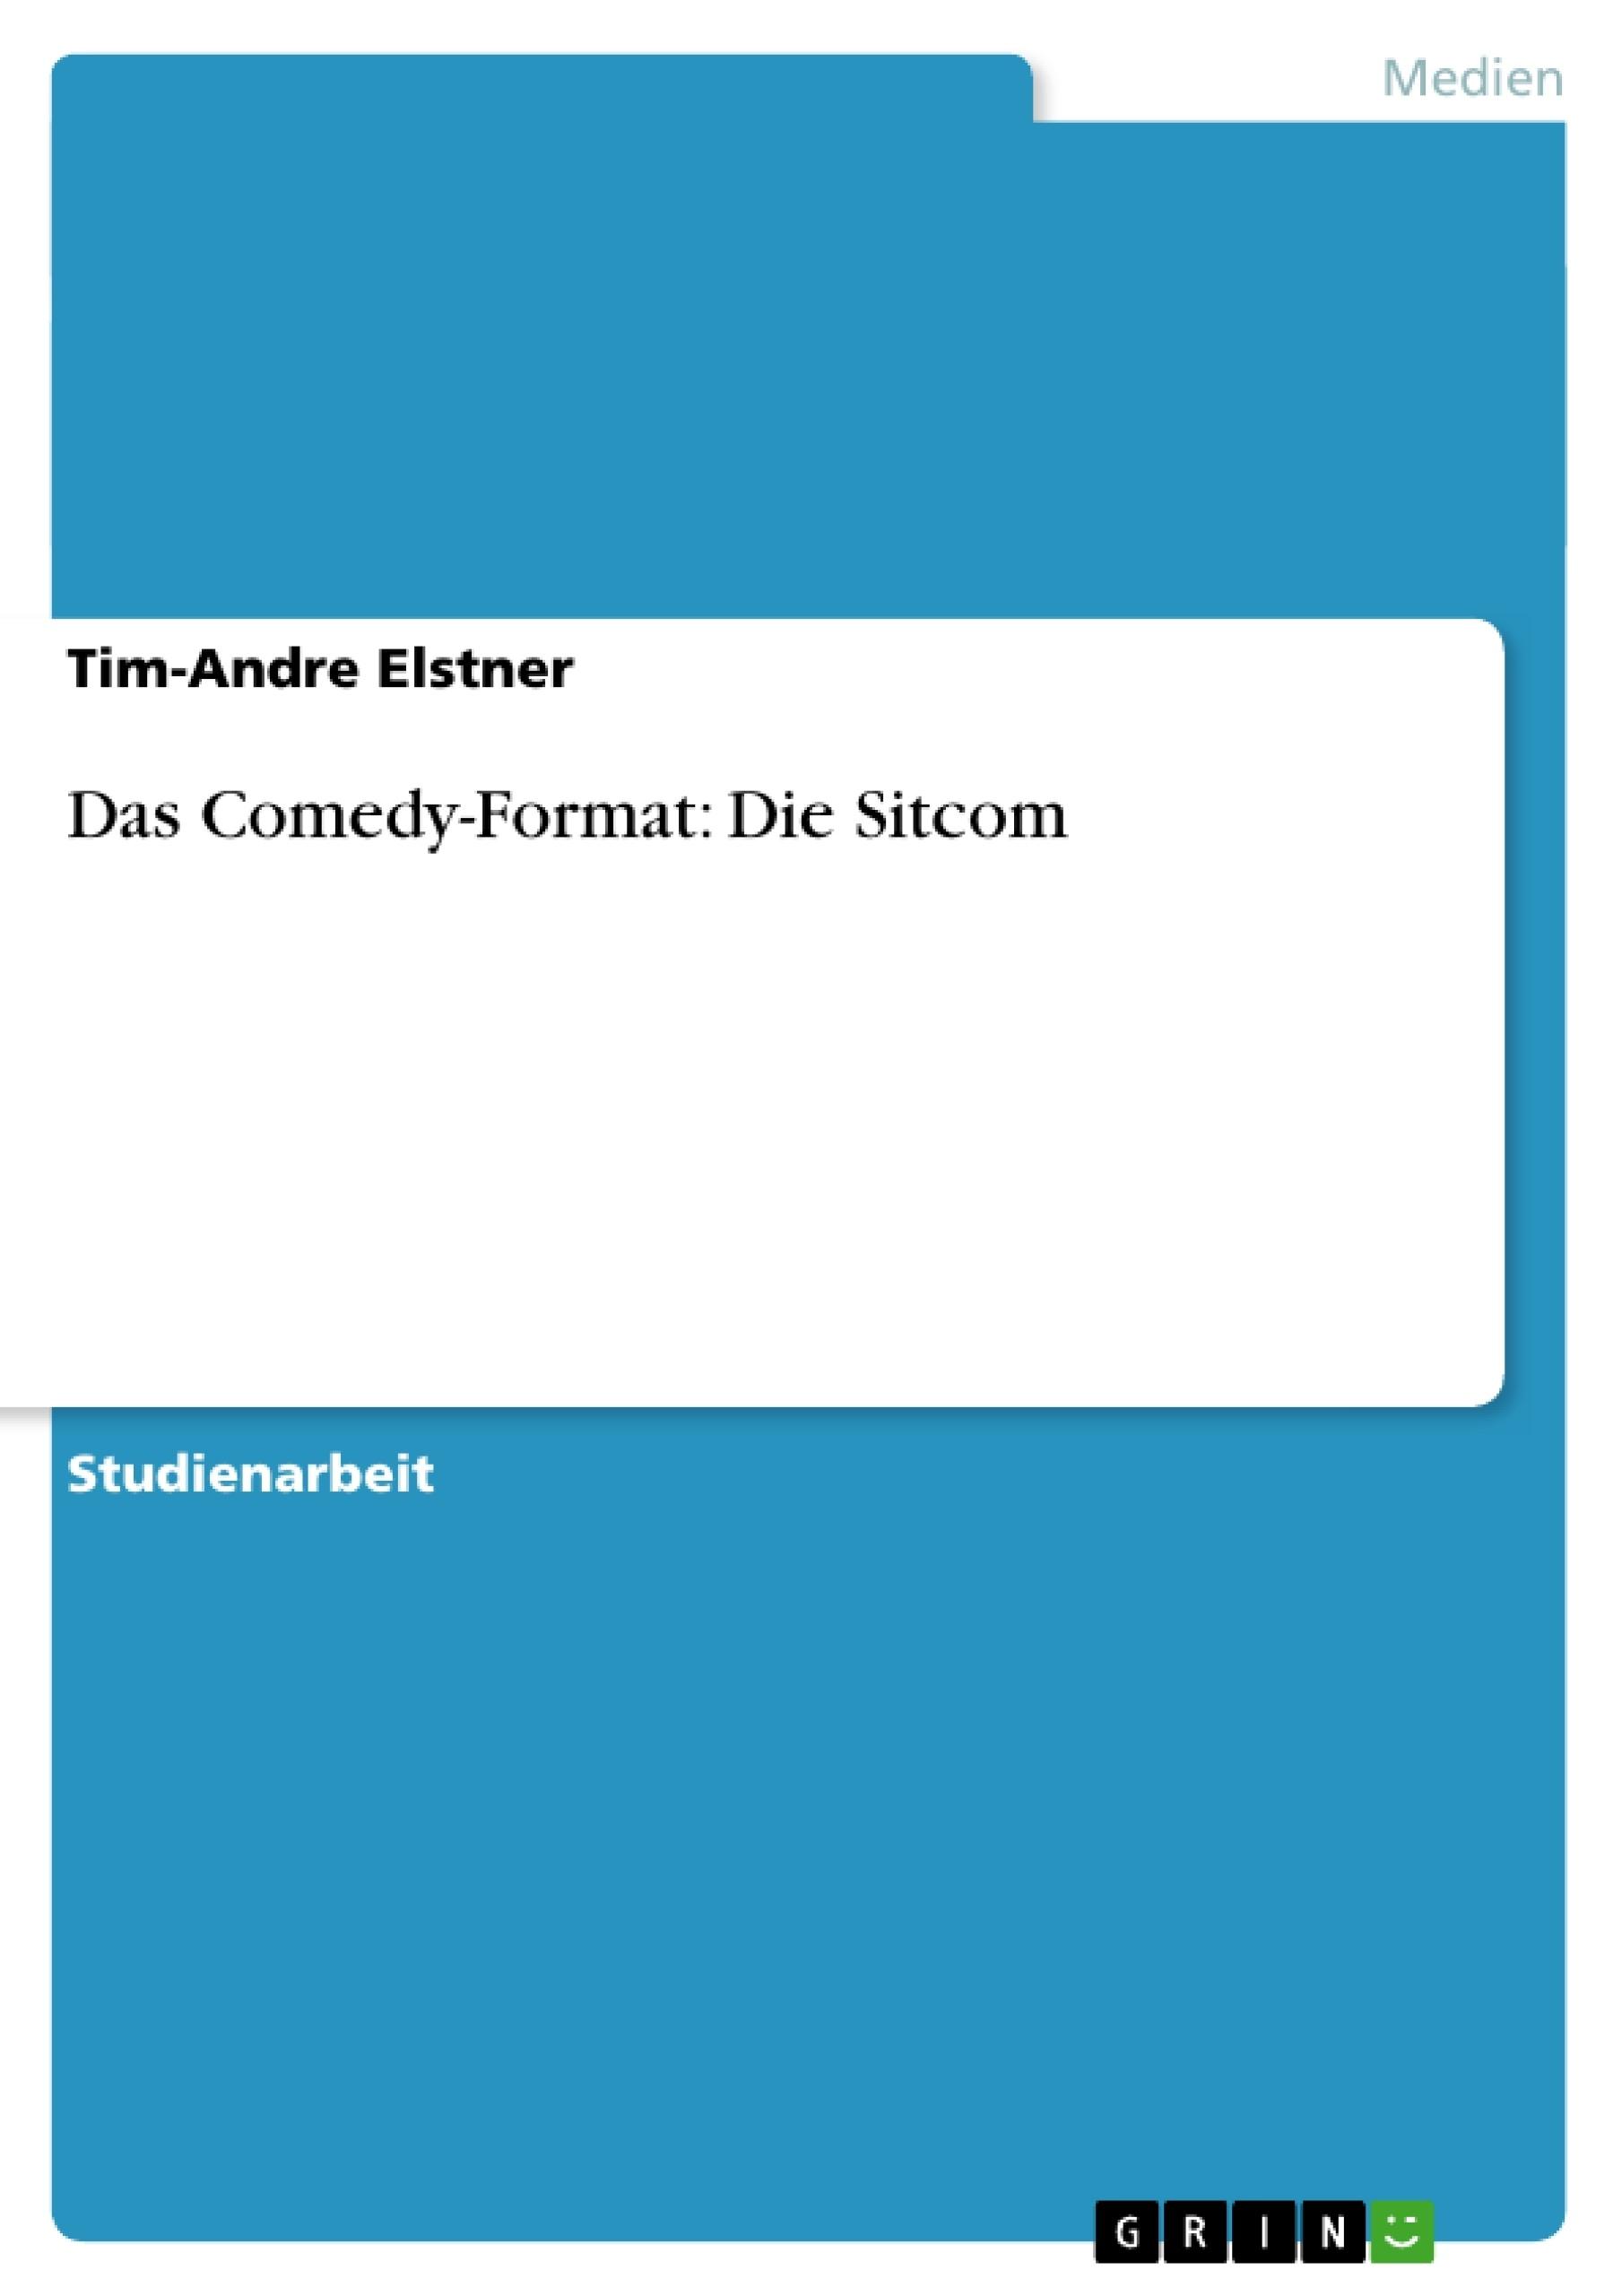 Titel: Das Comedy-Format: Die Sitcom